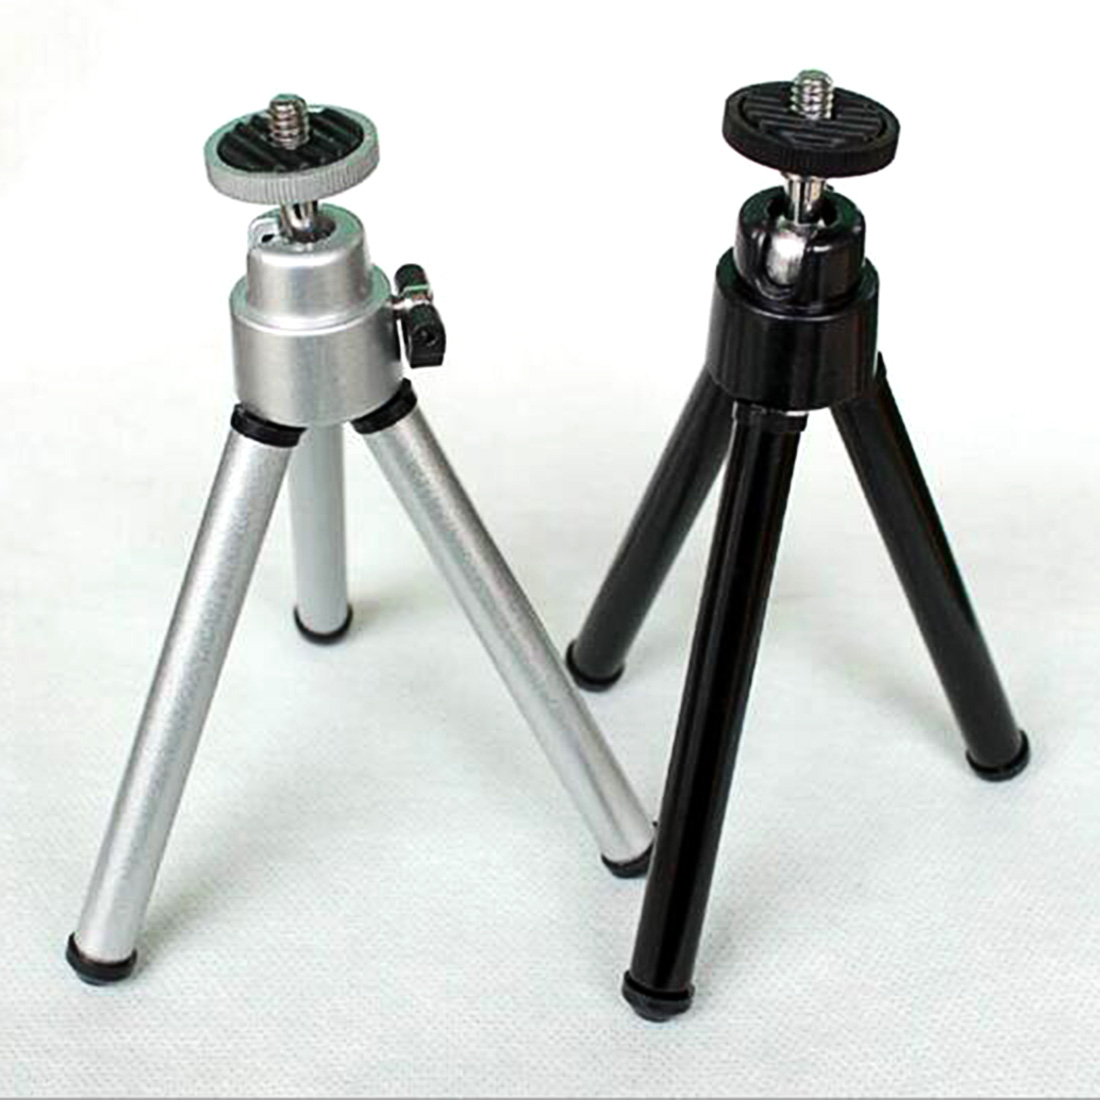 Etmakit Hot Selling Universal Mini Stand font b Tripod b font Mount Holder For Phone For